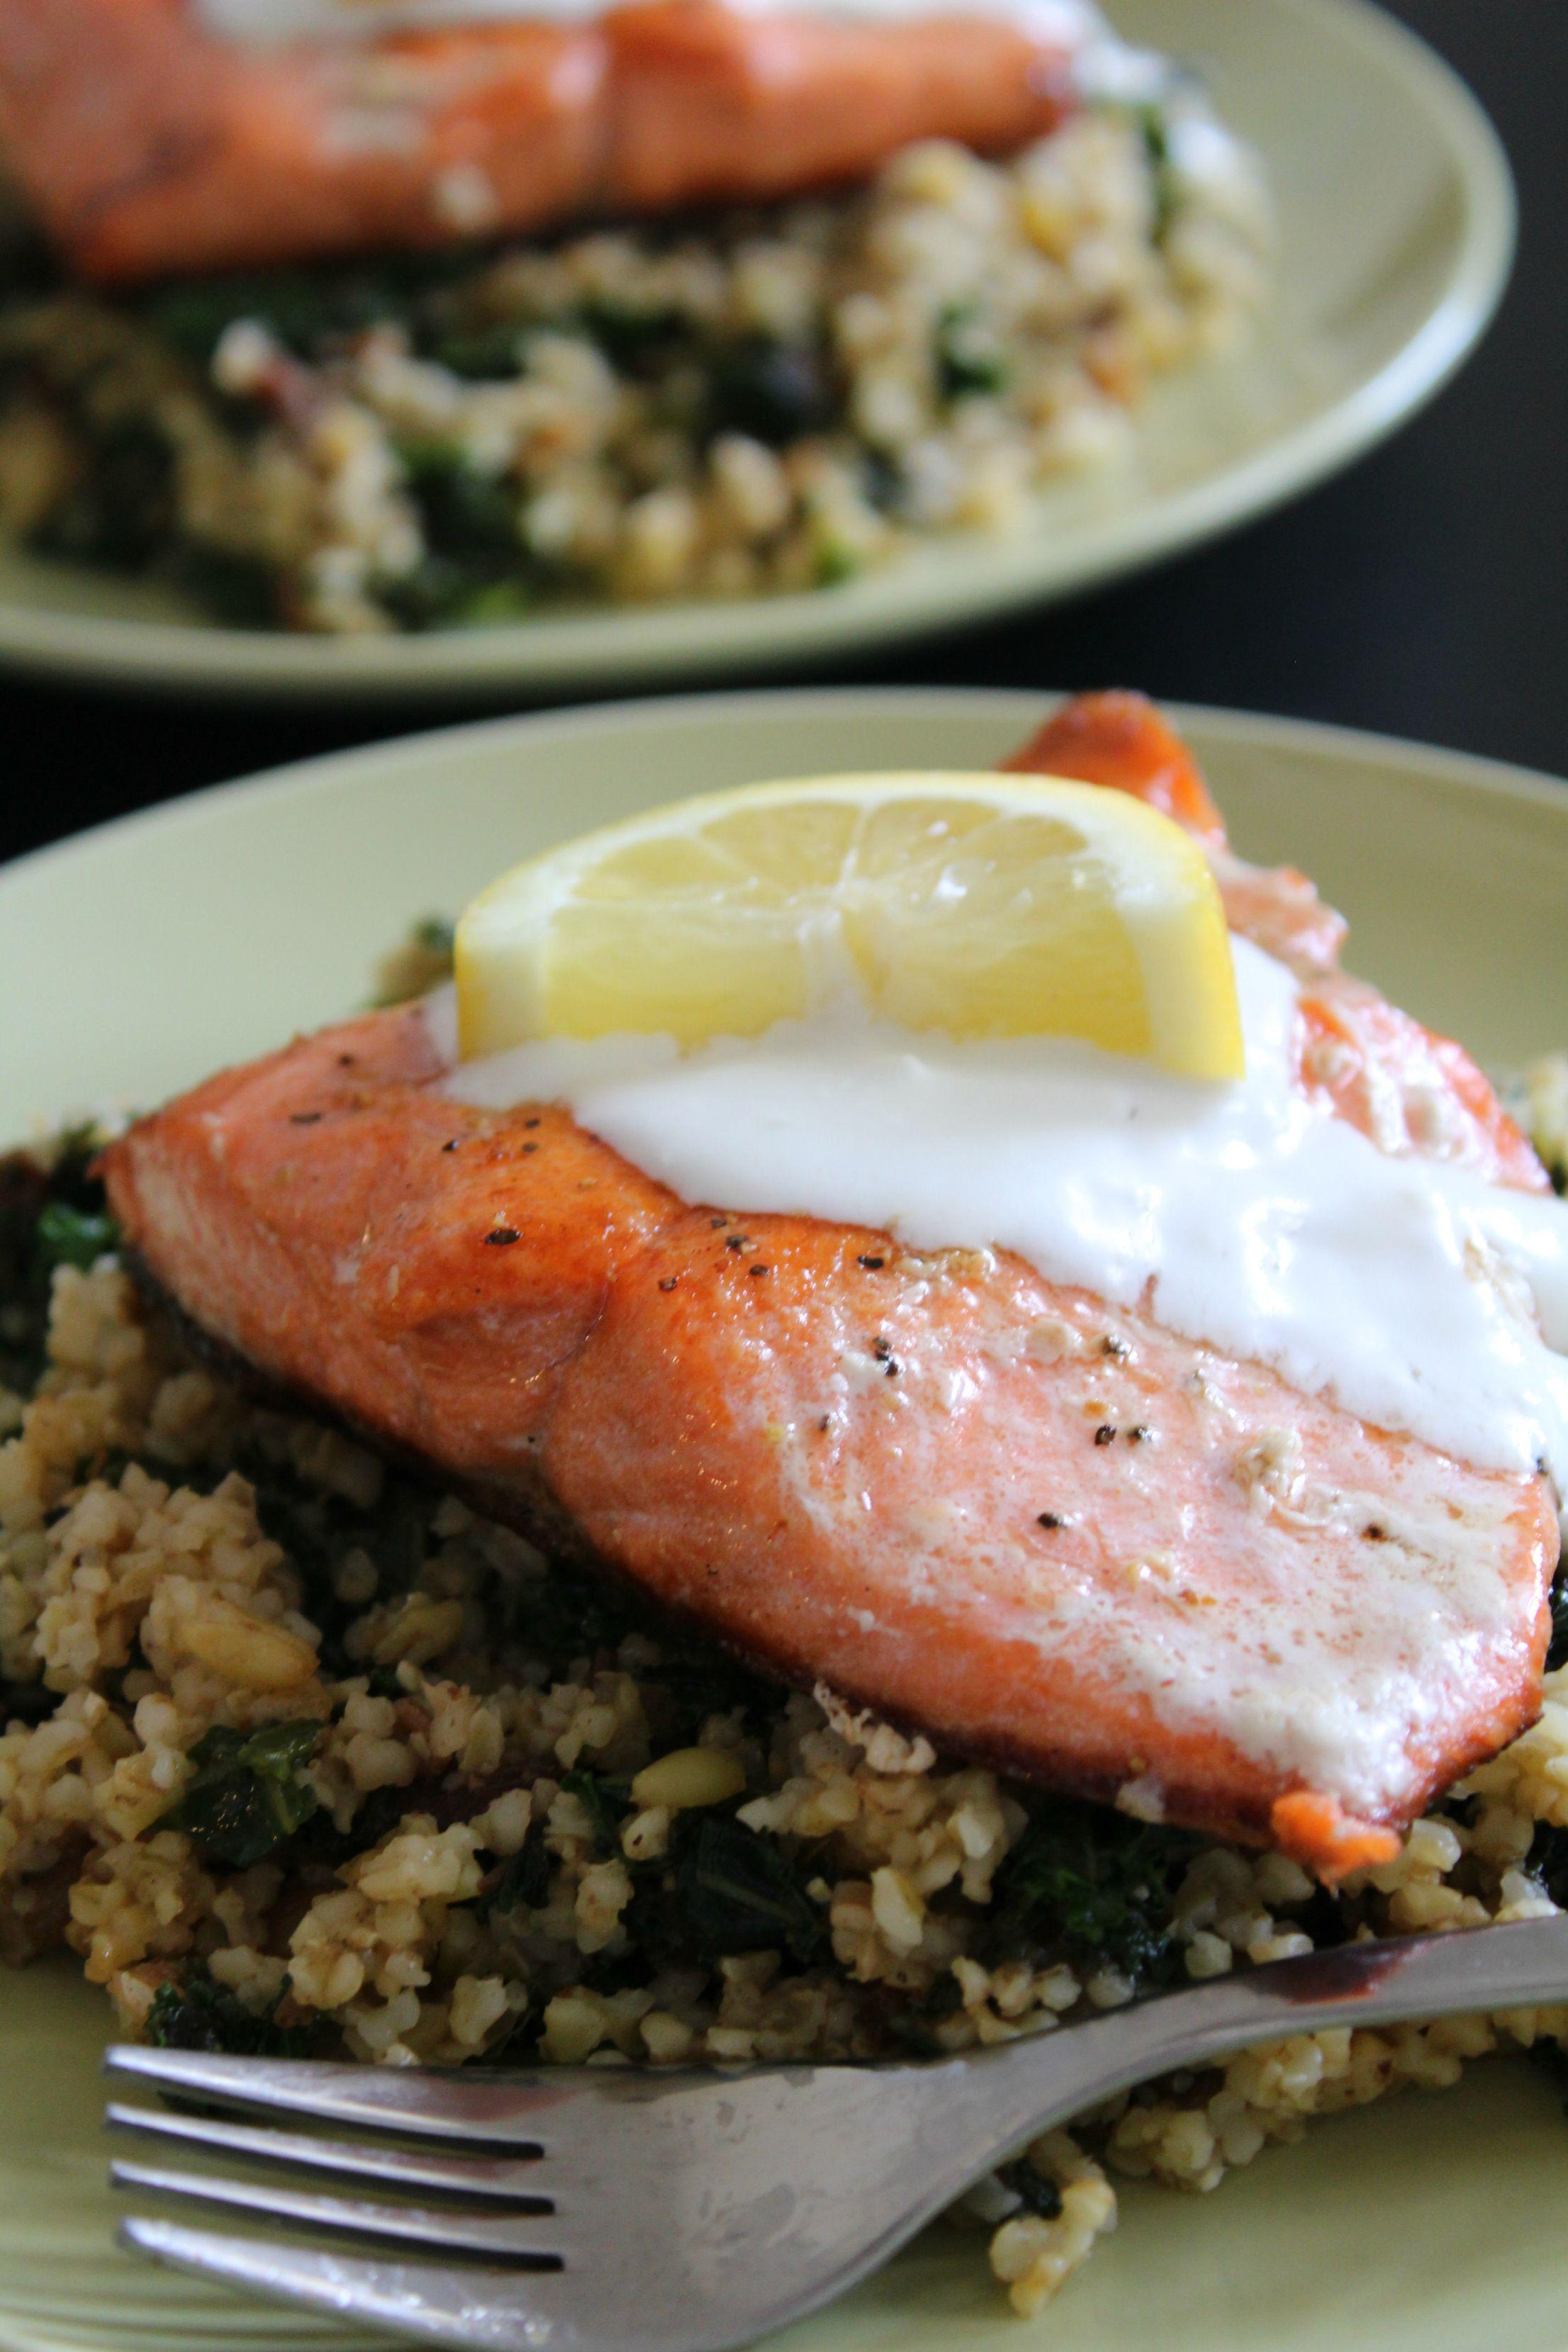 Blue apron salmon - Seared Salmon With Lemon Labneh Ad Blueapron Blueapron